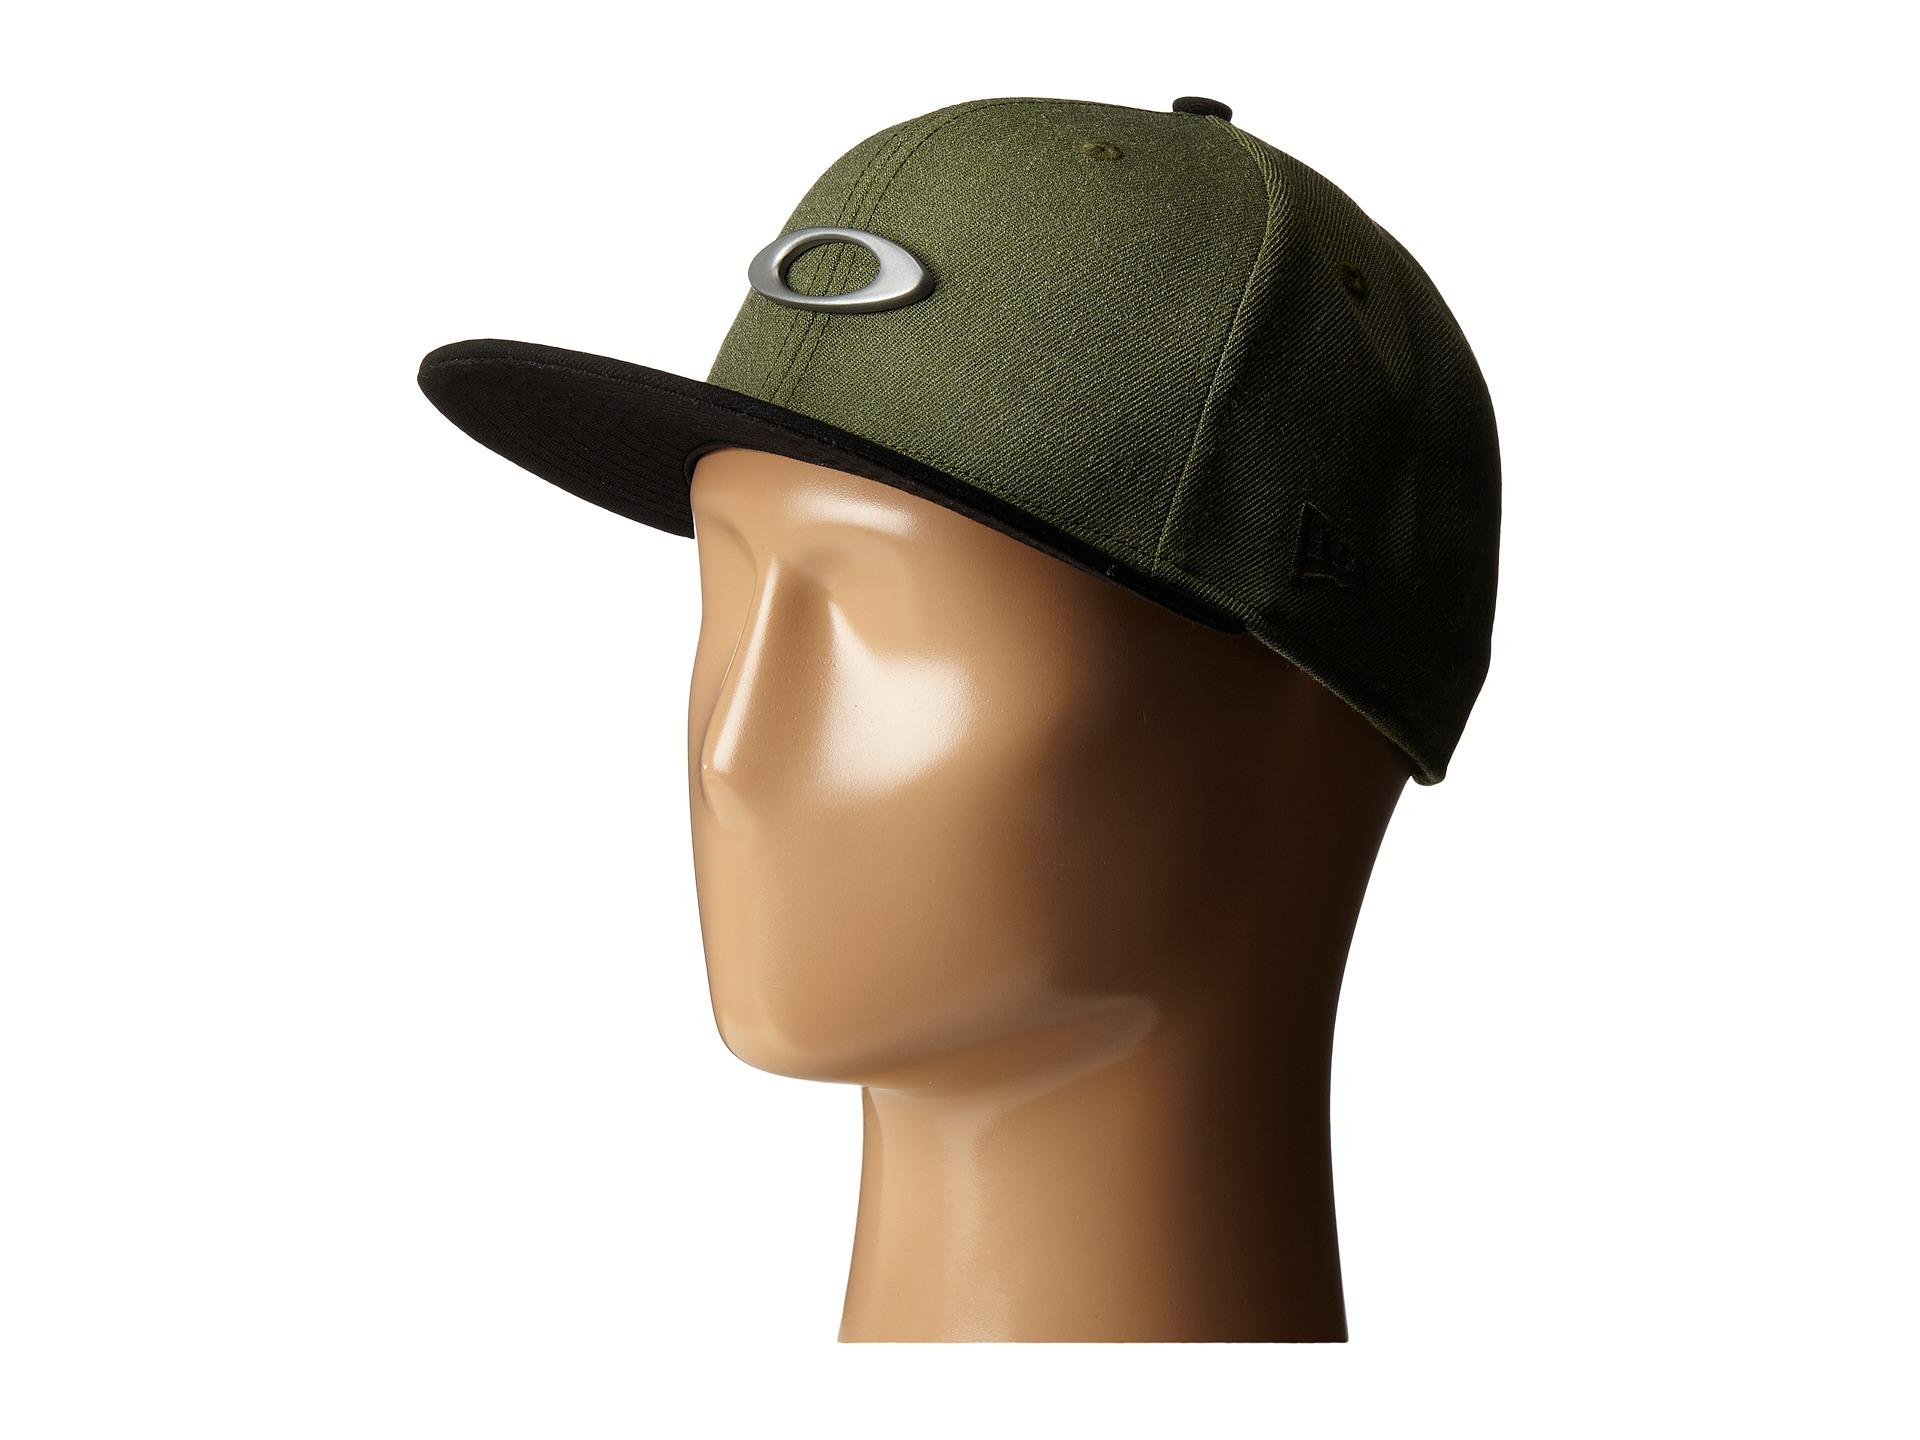 buy popular 889bb abbc8 promo code lyst oakley tincan hat in green for men a3e12 0f8b3  shop lyst  oakley o justable metal cap in green for men d3835 aaf87